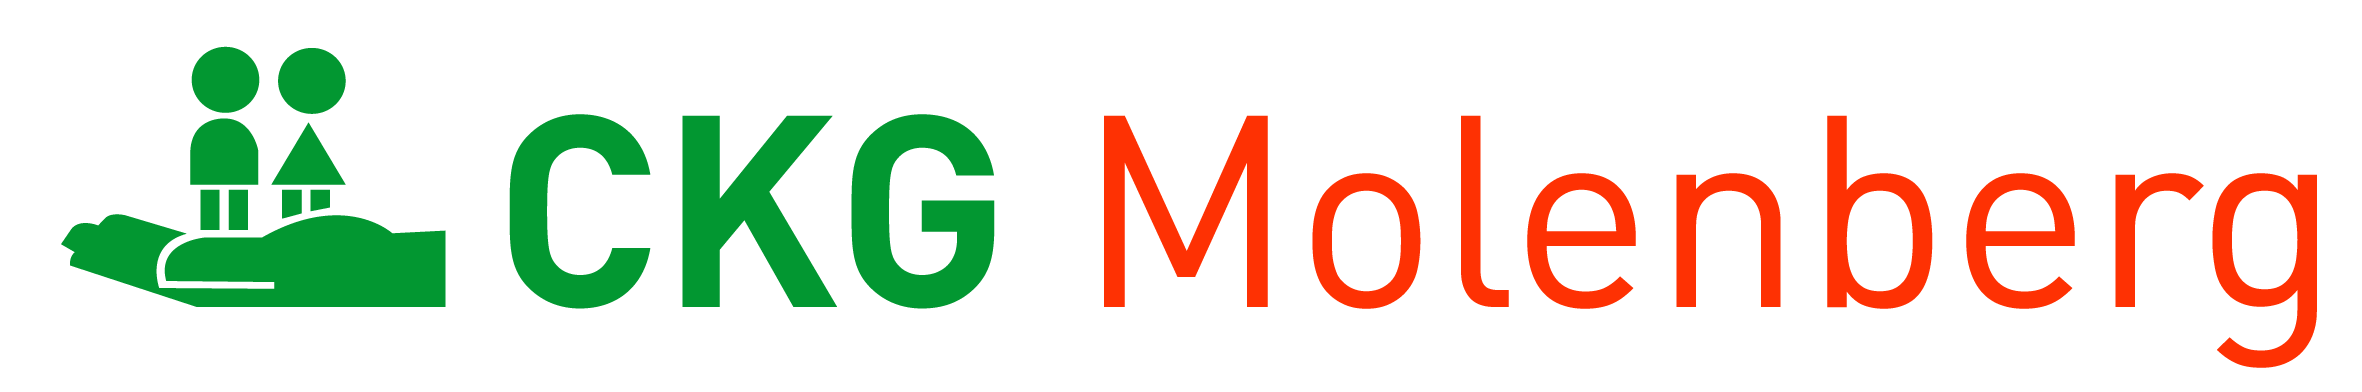 CKG Molenberg Logo